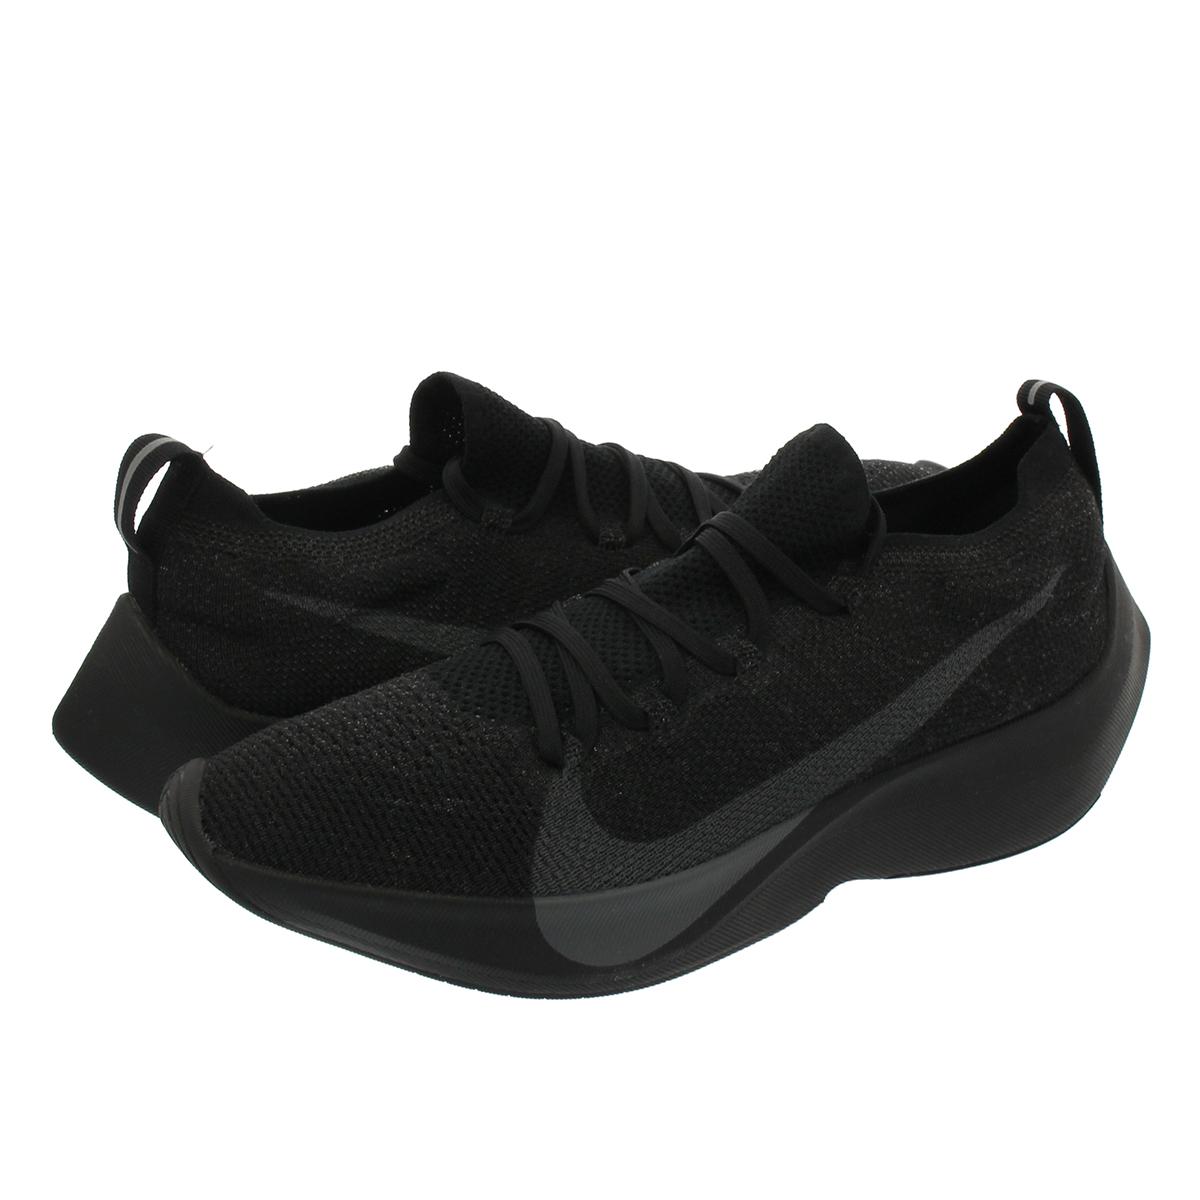 6f79374b5 SELECT SHOP LOWTEX: NIKE VAPOR STREET FLYKNIT Nike vapor street fried food  knit BLACK/ANTHRACITE | Rakuten Global Market